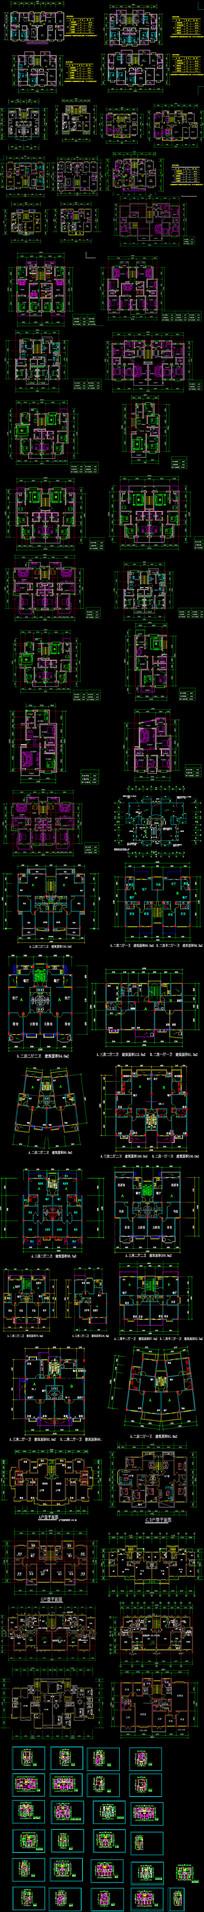 几百套CAD平面户型图